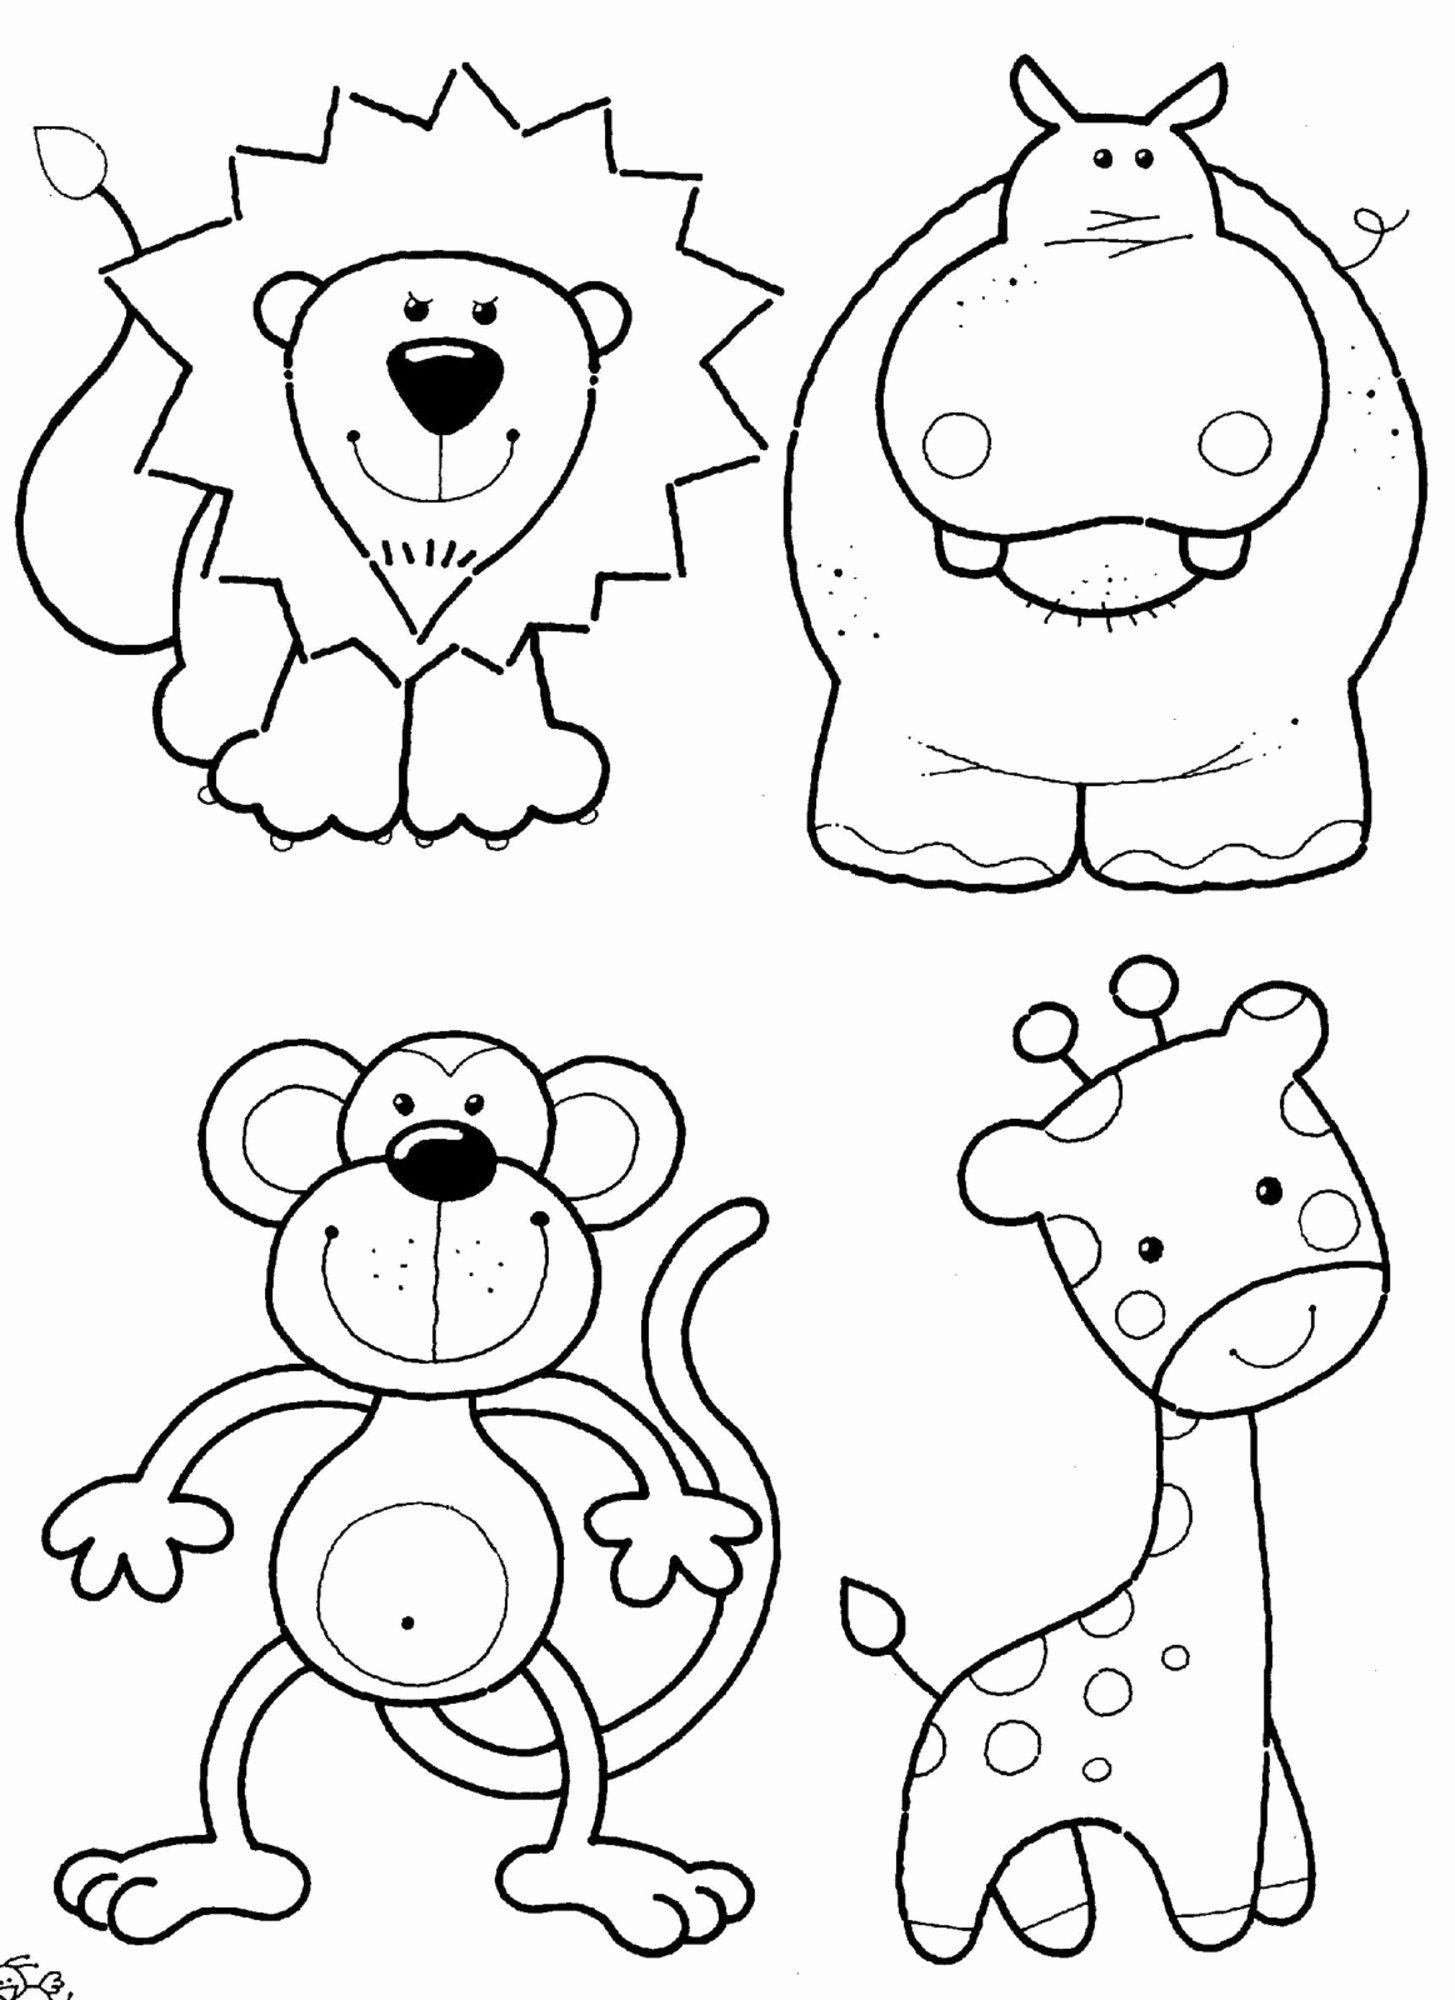 Animal Worksheets For Preschoolers